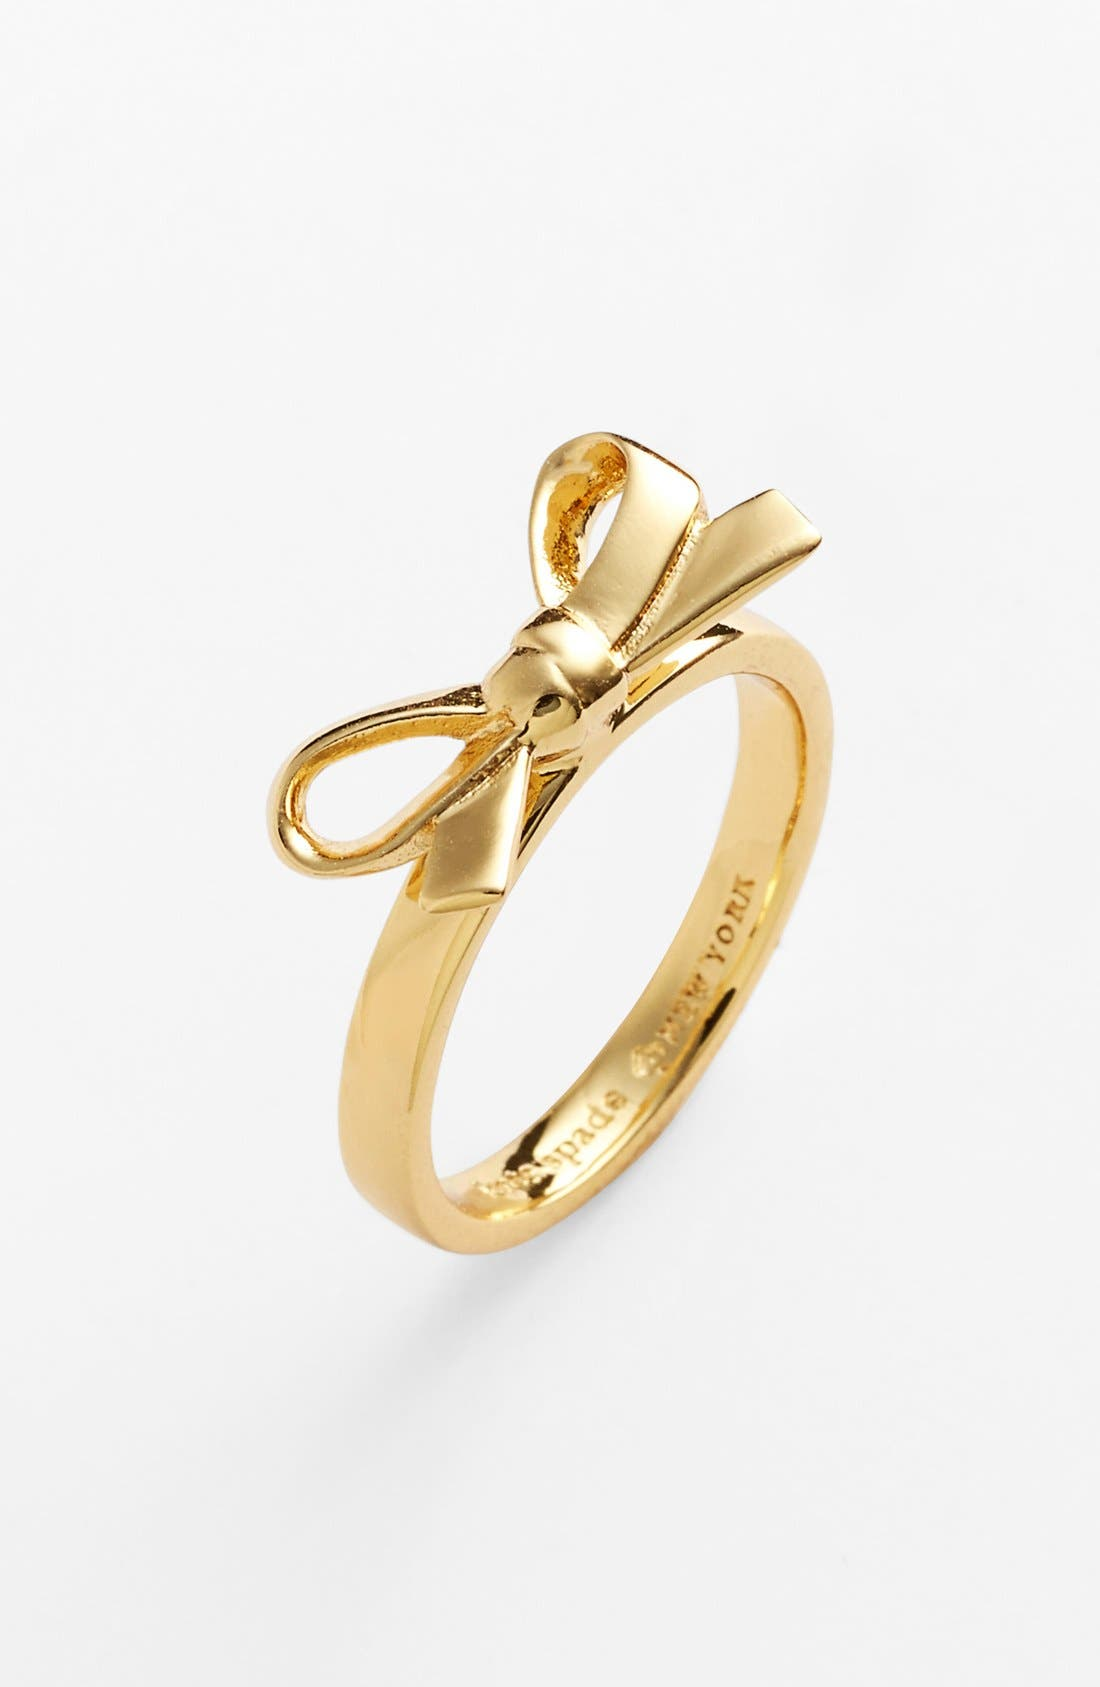 Alternate Image 1 Selected - kate spade new york 'skinny mini' bow ring